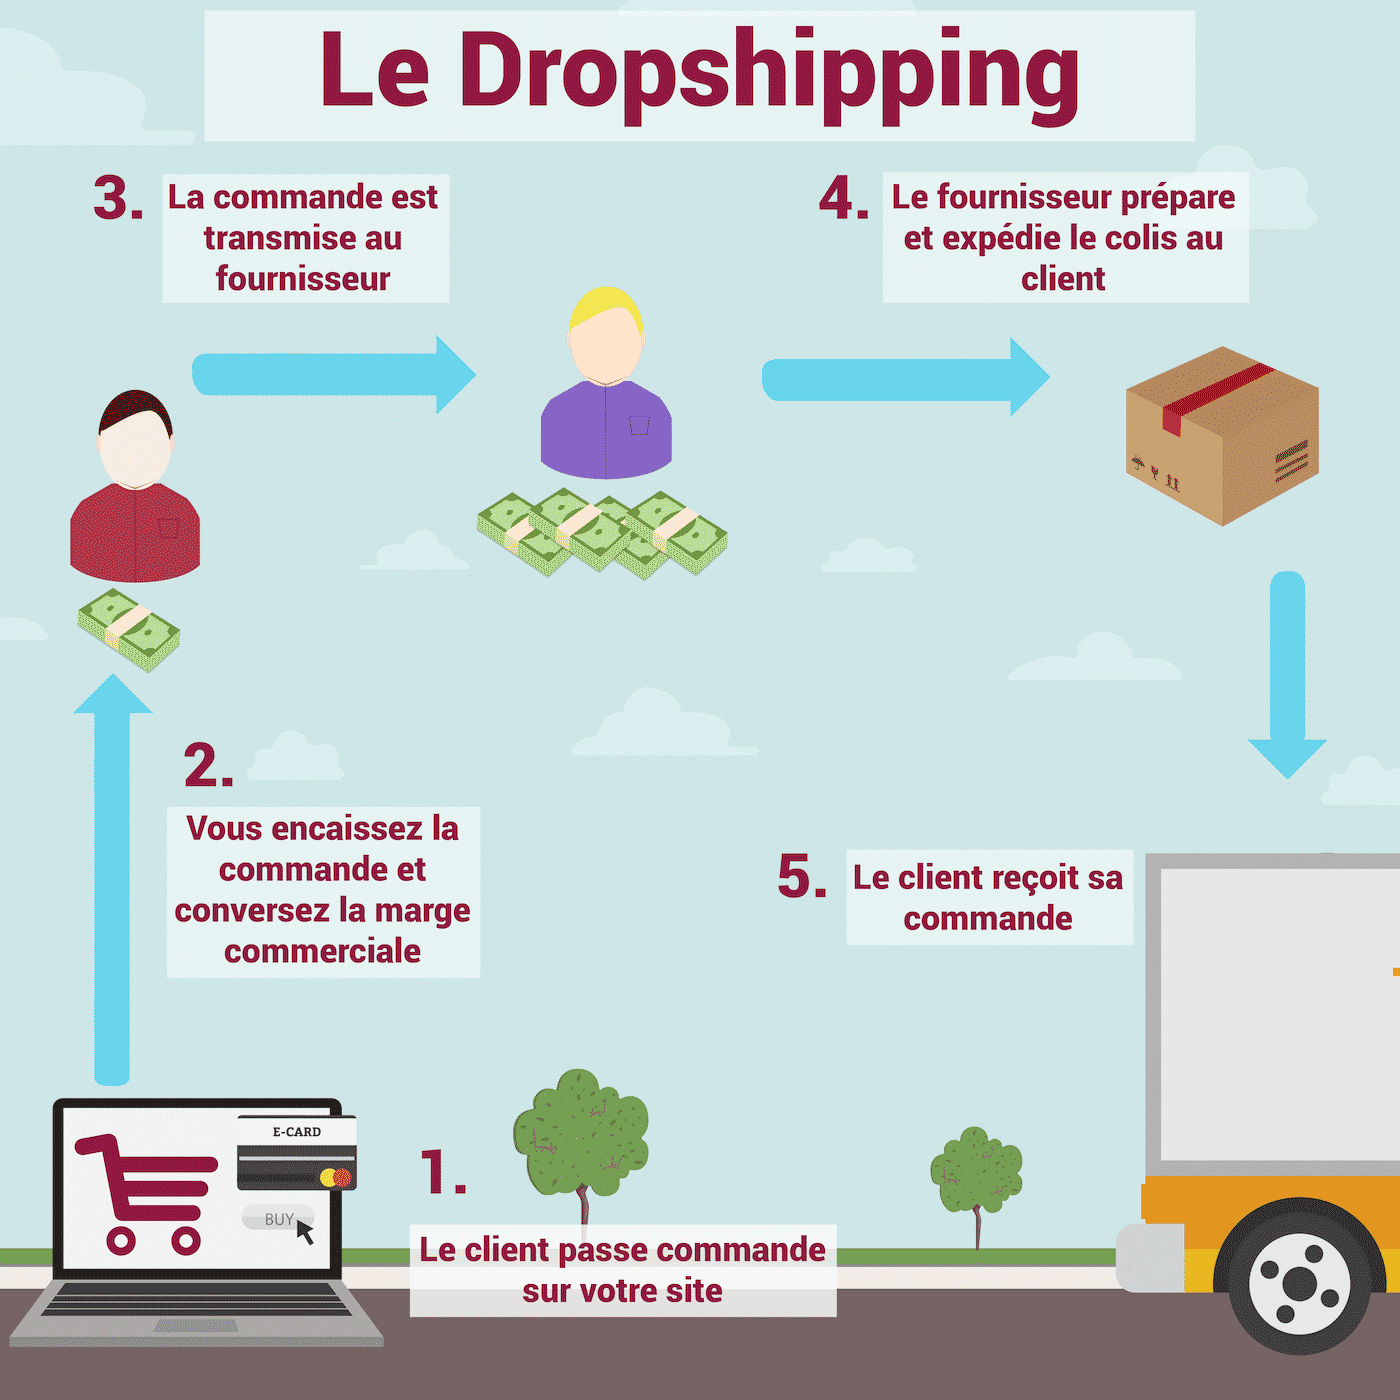 Explication du dropshipping